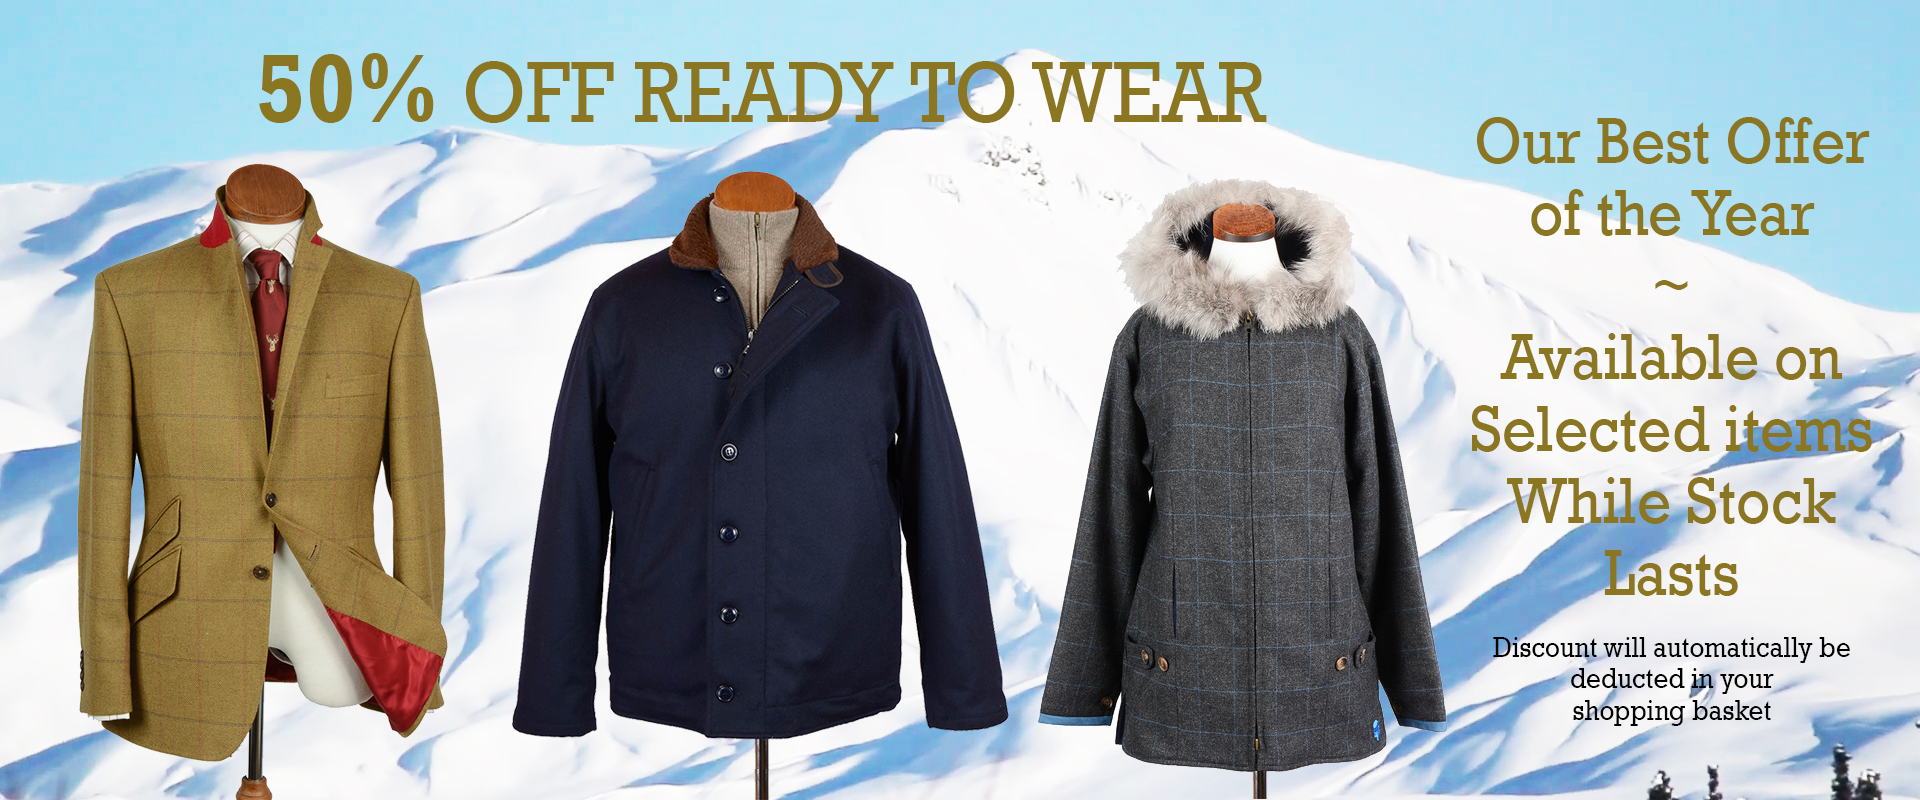 Tweed Jackets Sale